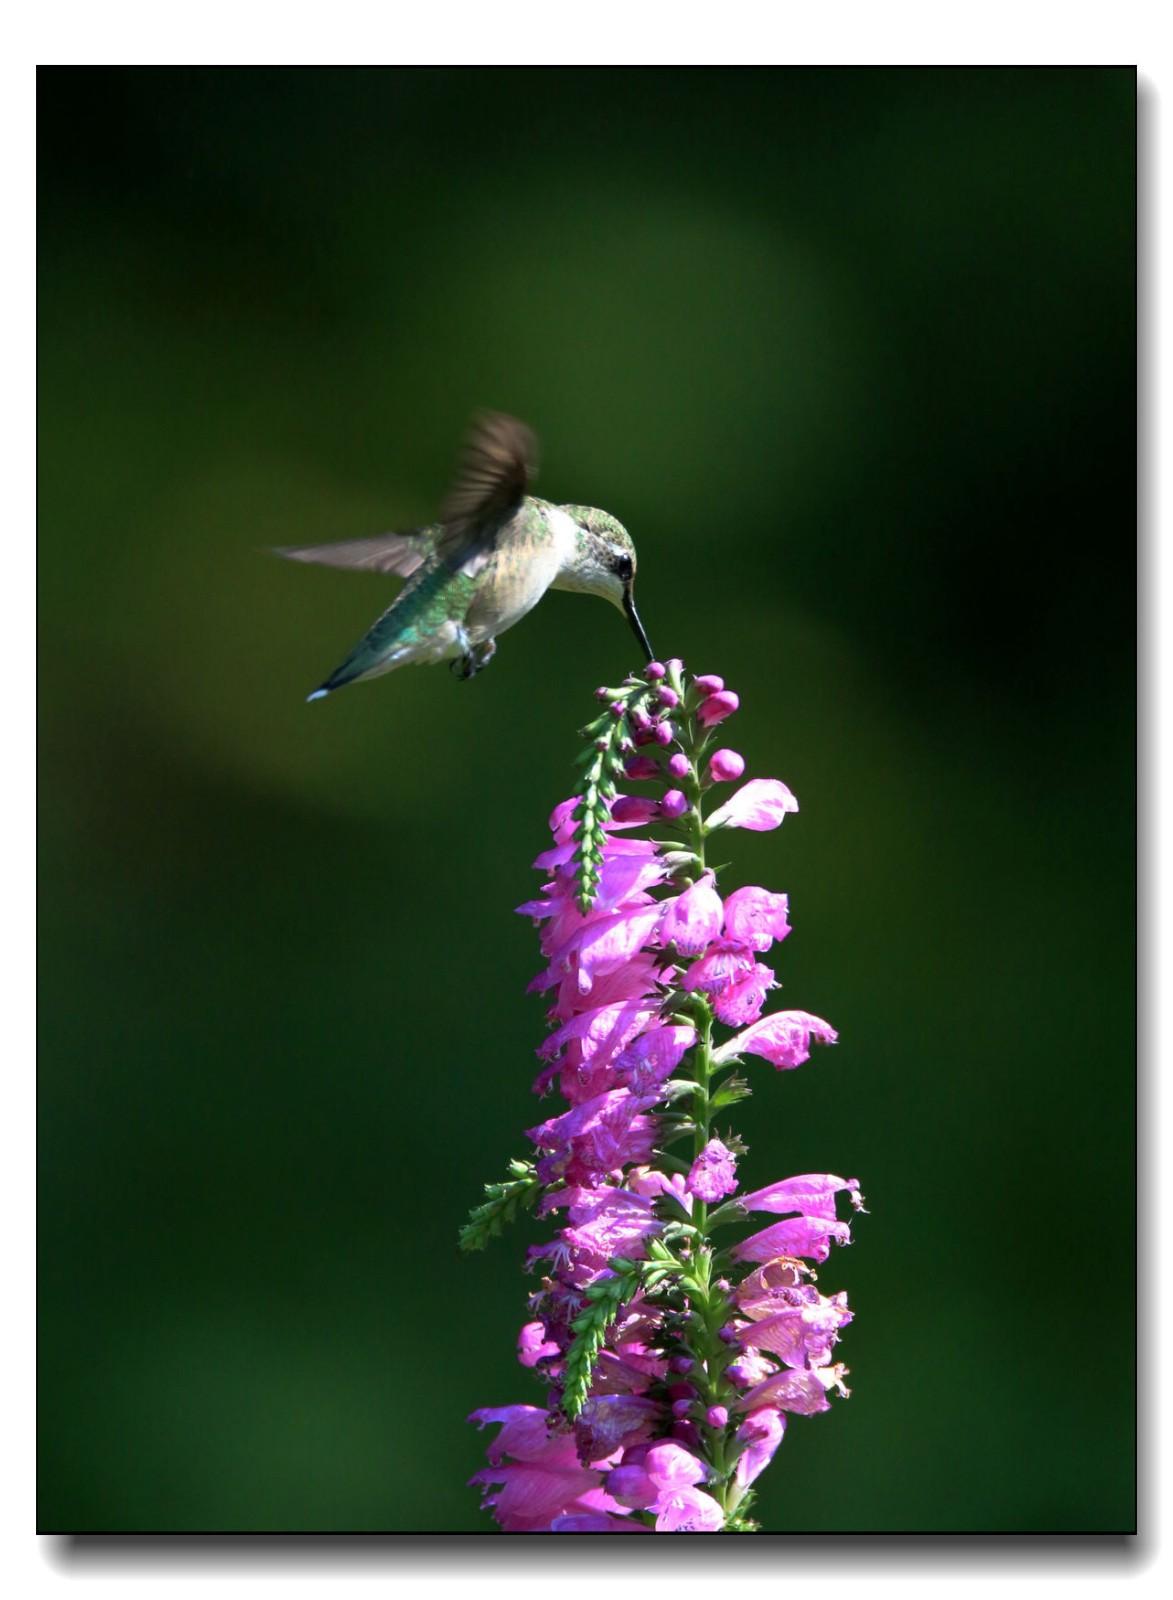 蜂鸟组图(五)_图1-15